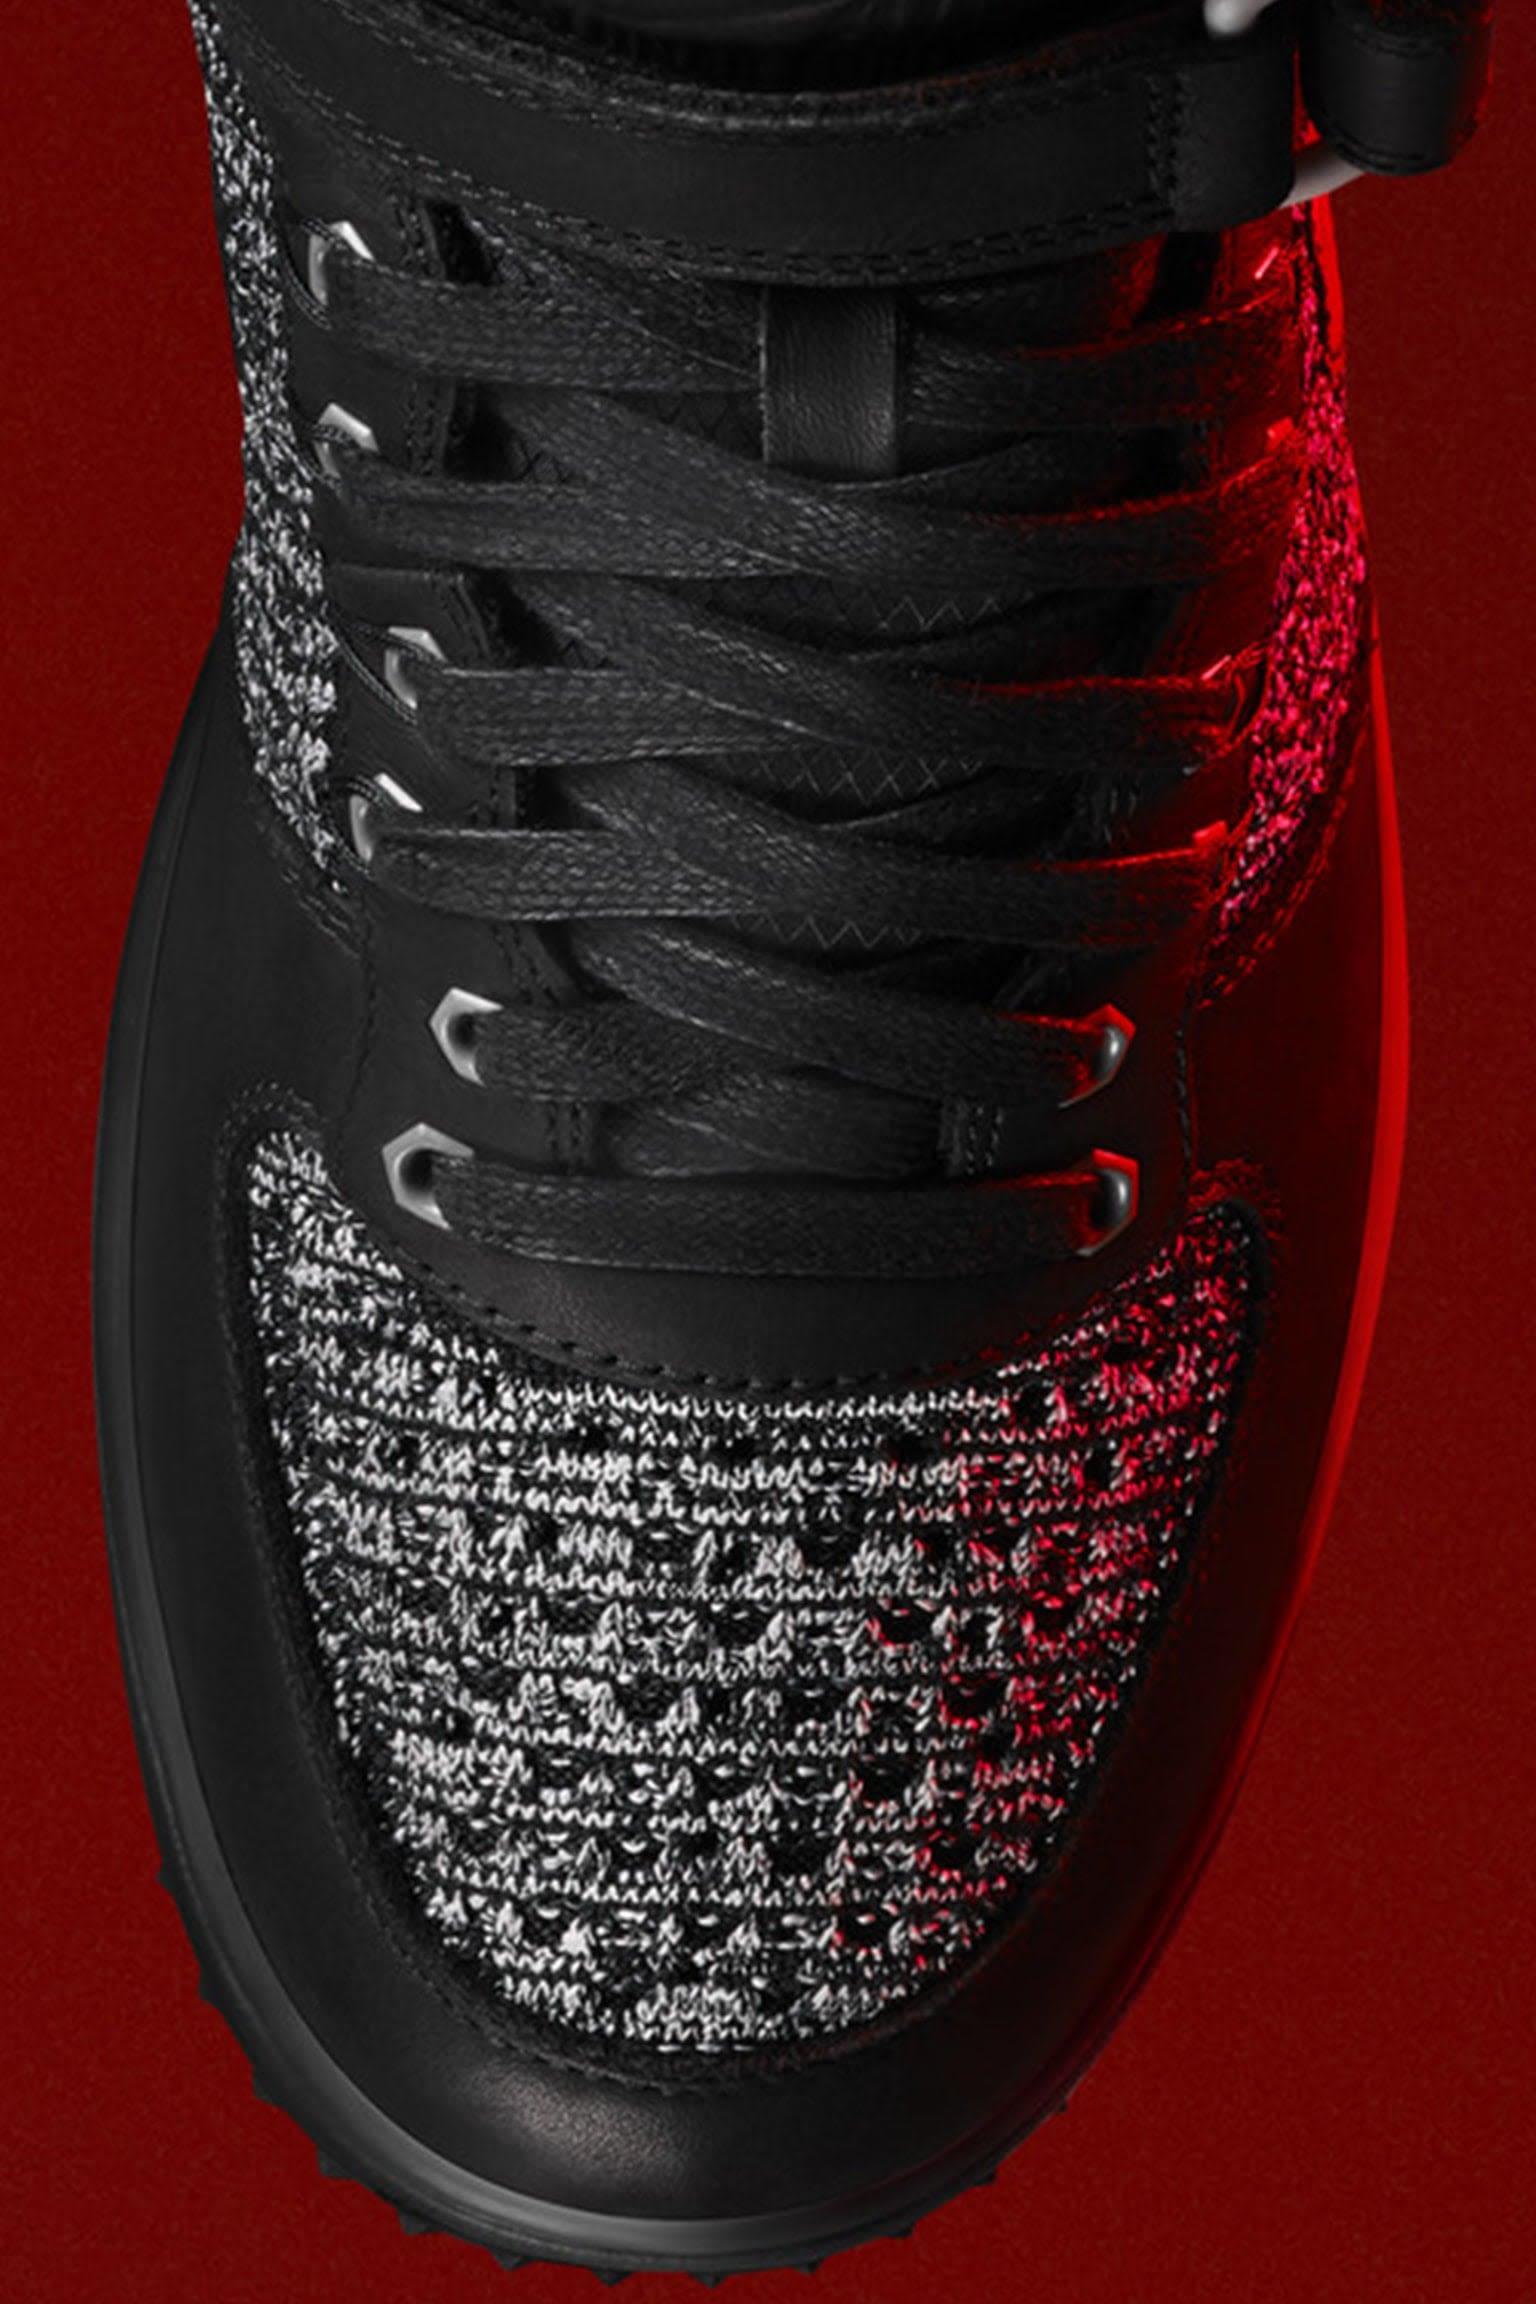 Nike Lunar Force 1 Flyknit Workboot 'Black & White' voor dames. Releasedatum